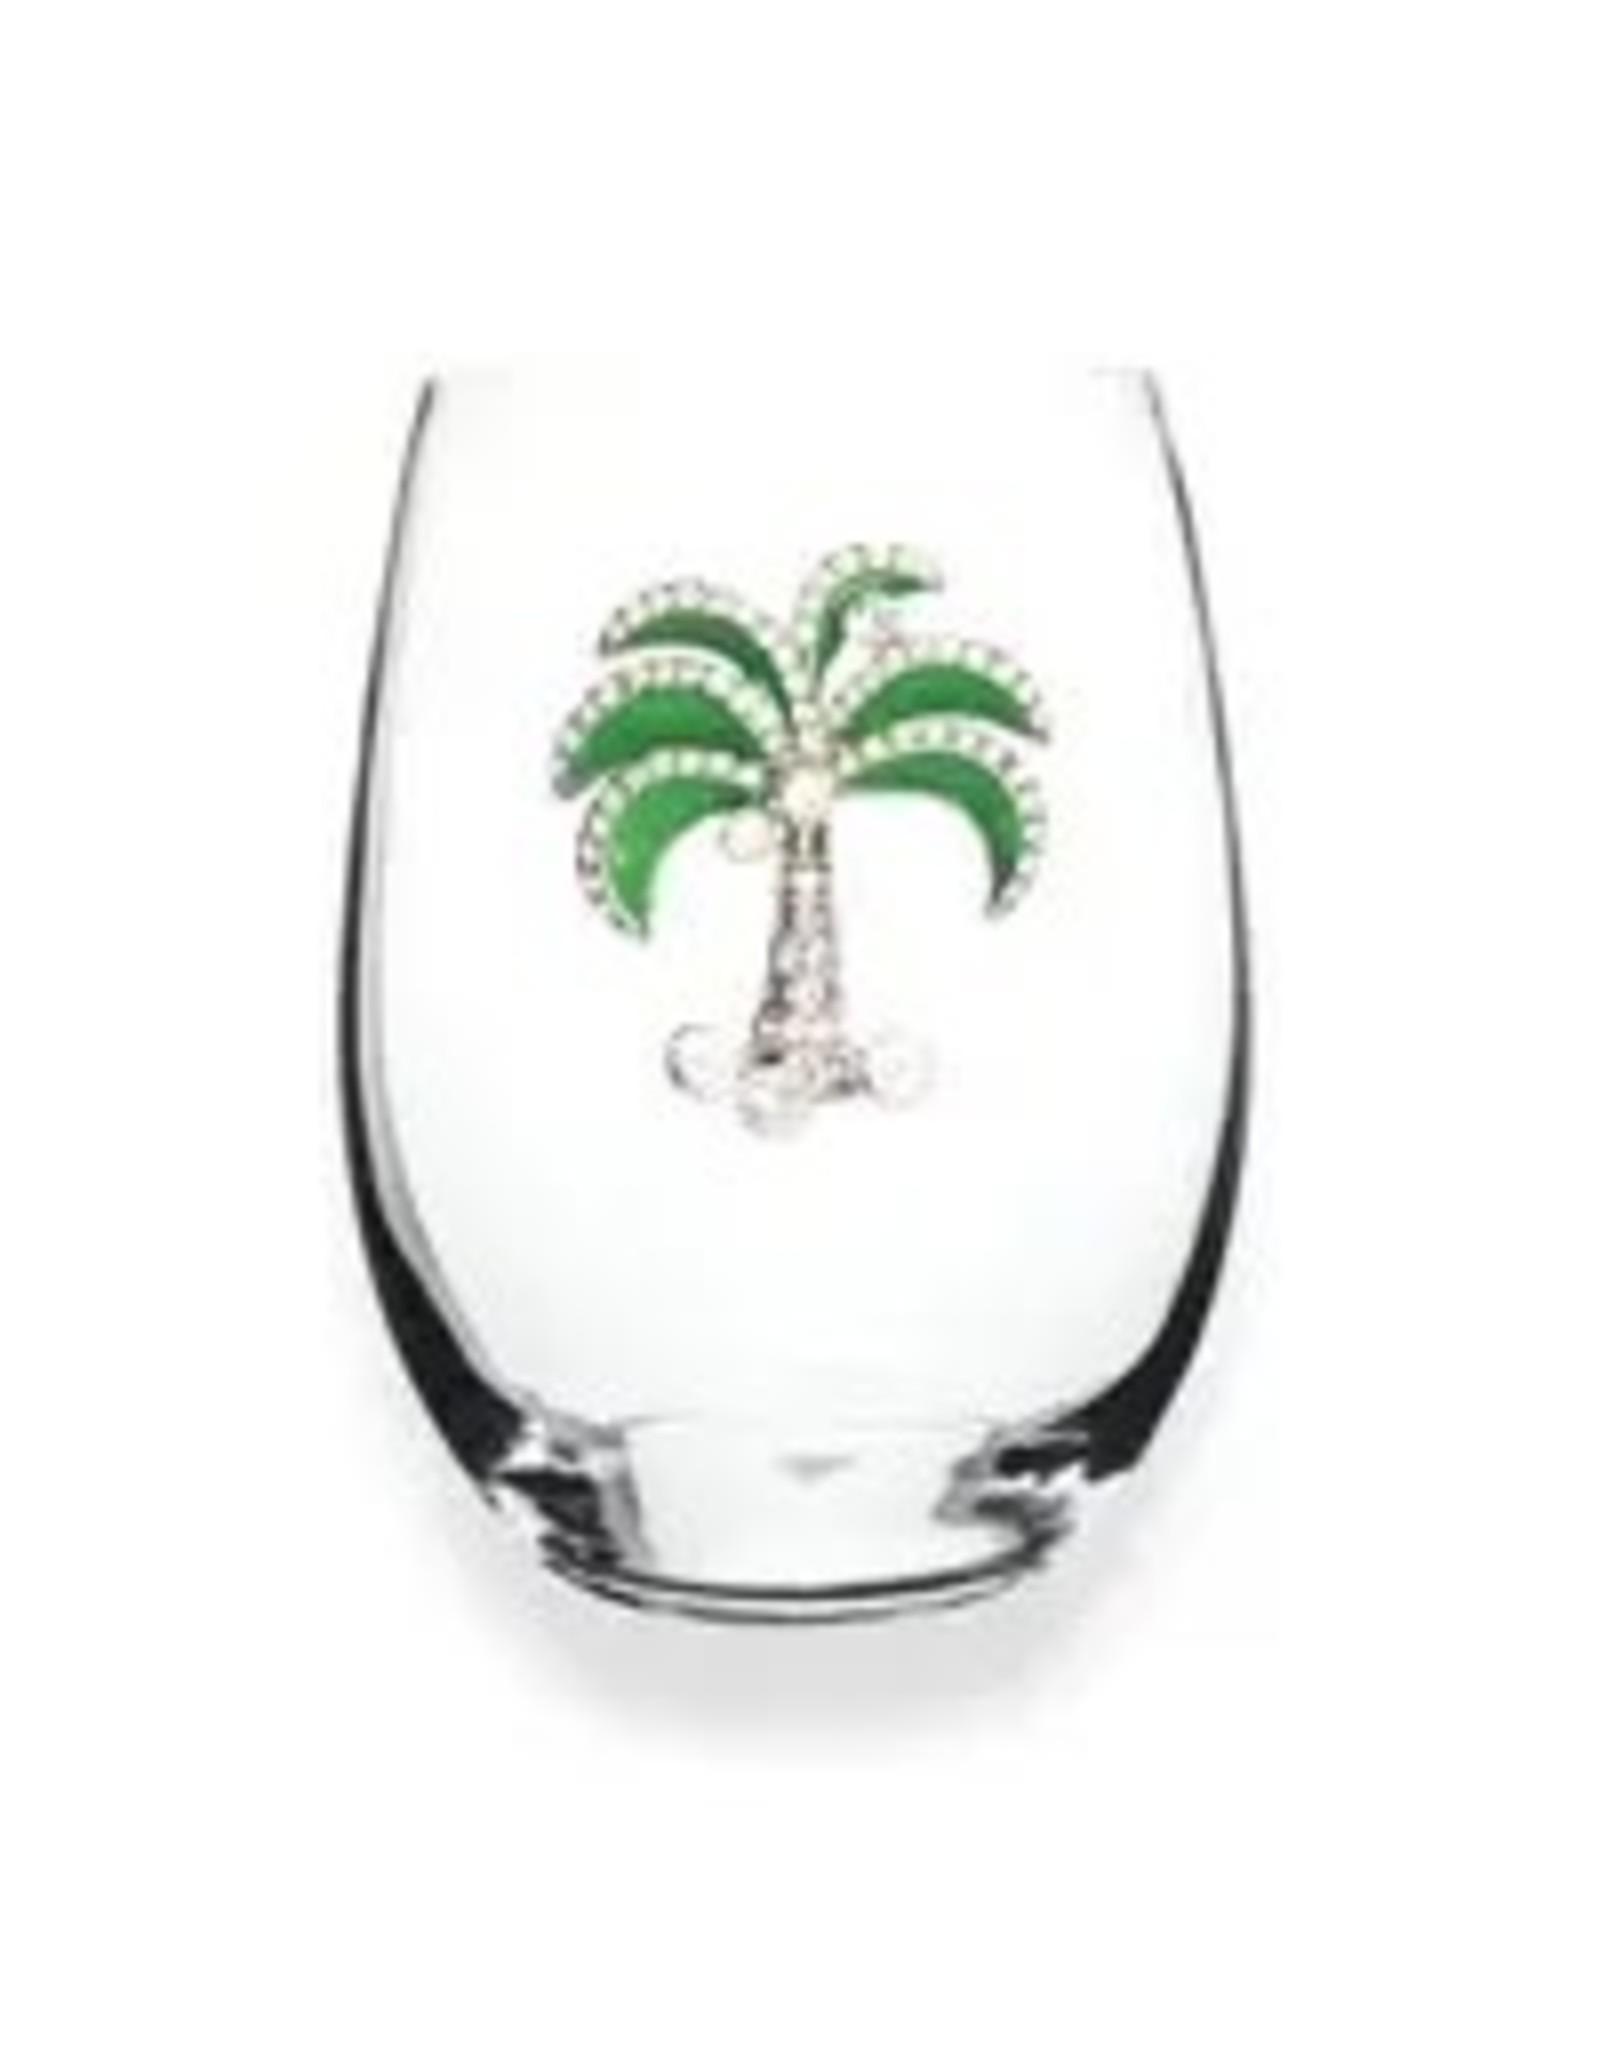 The Queen's Jewels Green Diamond Palm Tree Jeweled Stemless Wine Glass